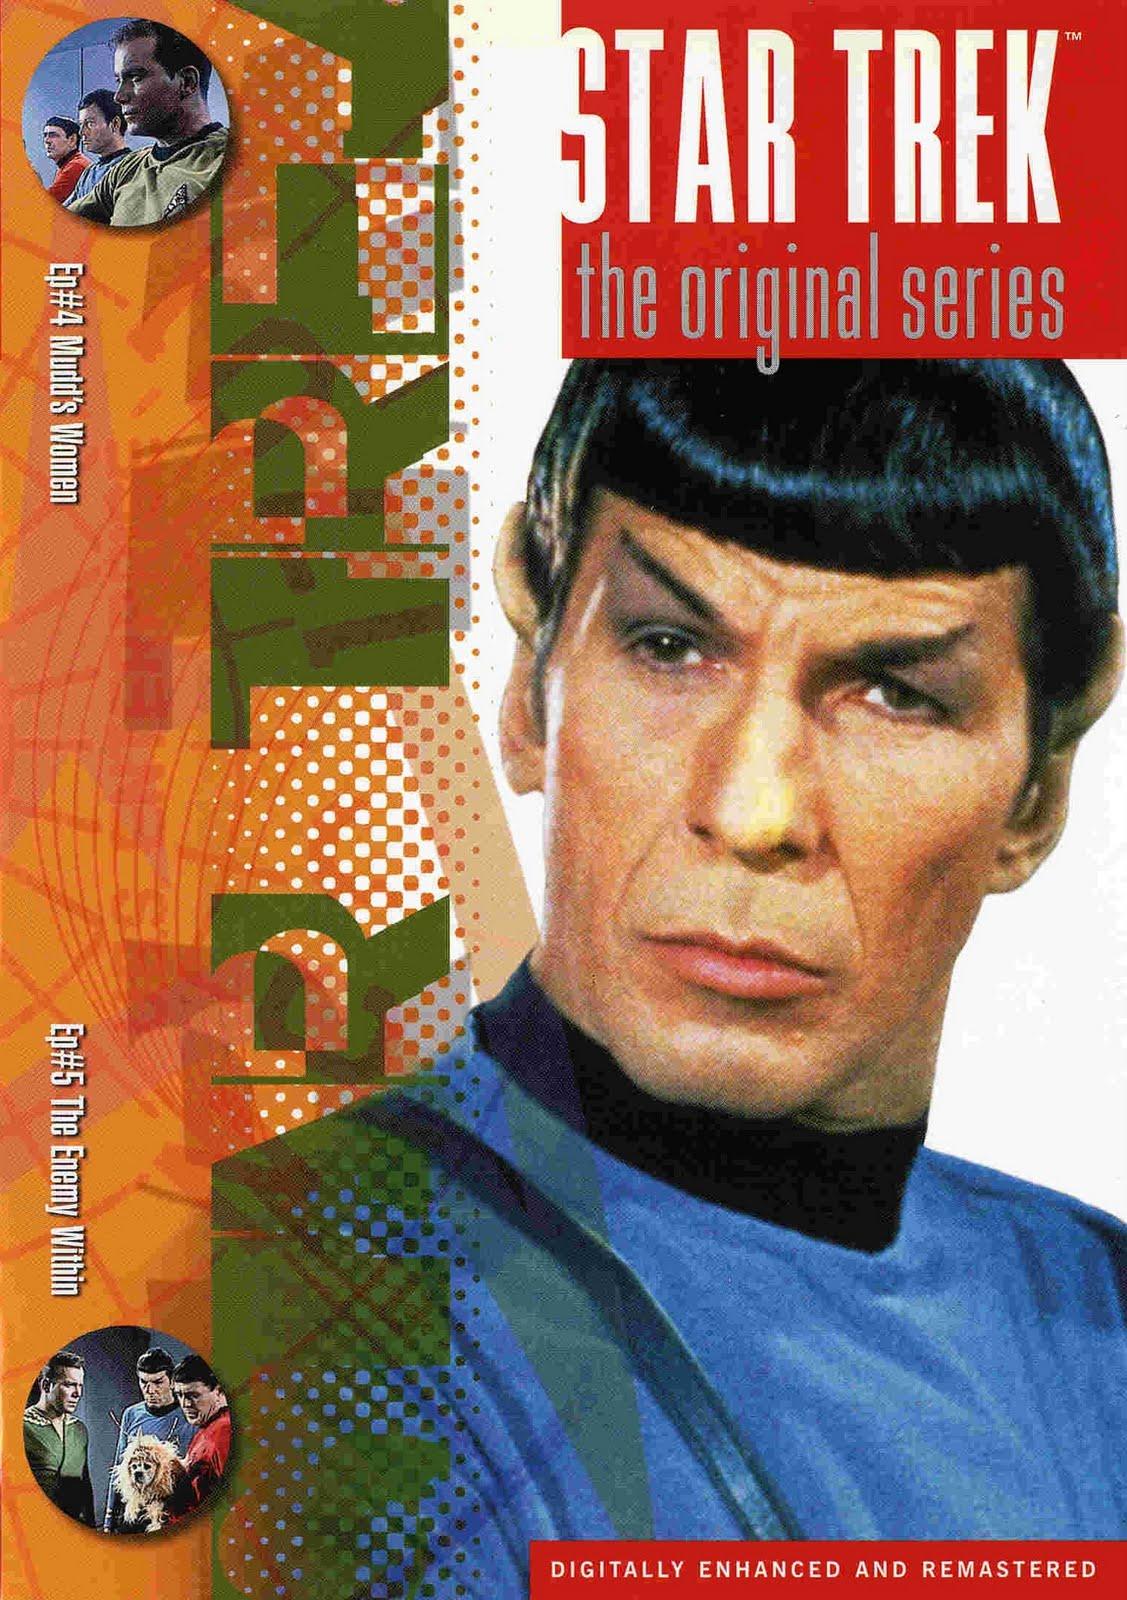 Star trek star trek the original series volume 08 front